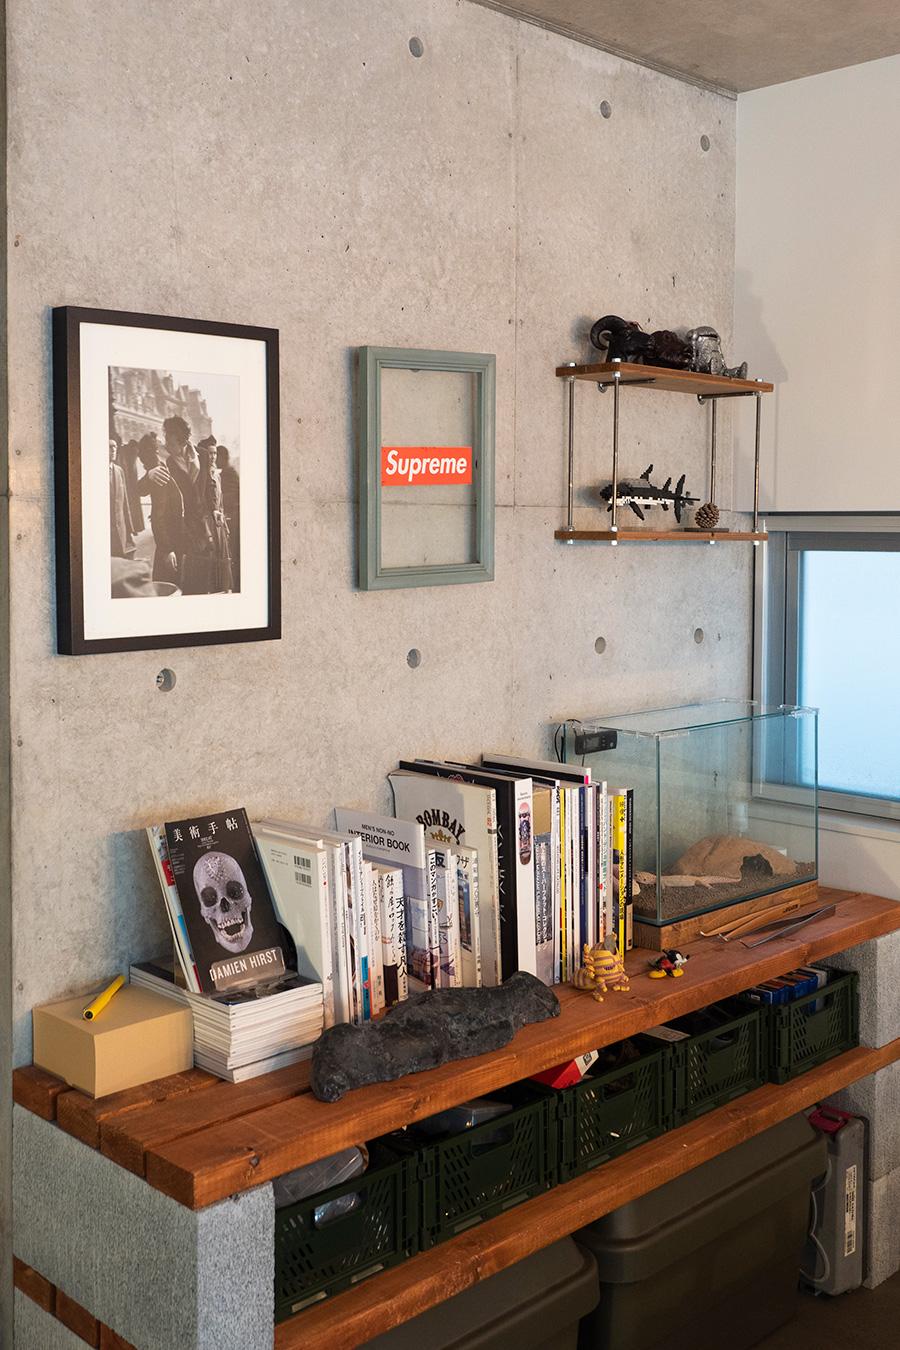 Pコン穴を使って壁をディスプレイ。上段にはペットのトカゲが。